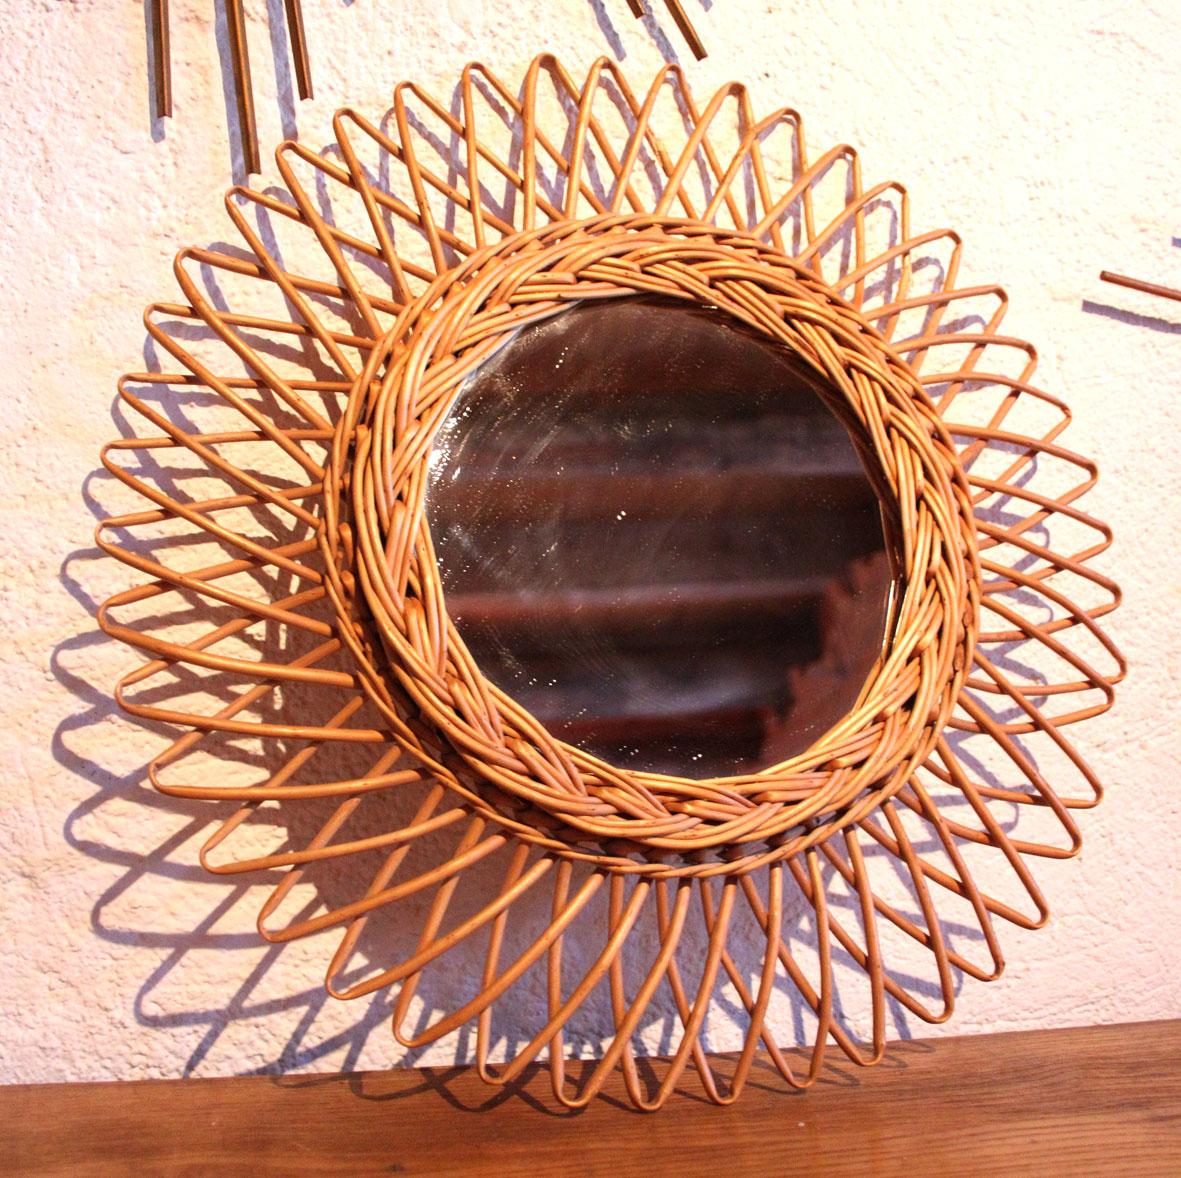 Chicbaazar objets vintage 50 60 70 miroir osier soleil for Miroir soleil osier